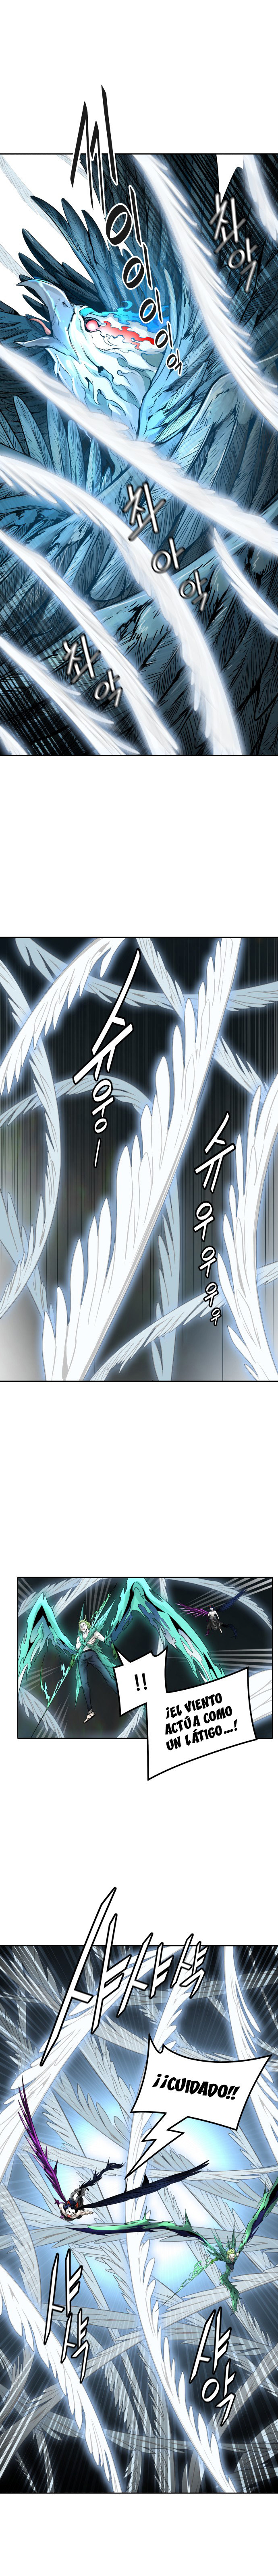 https://nine.mangadogs.com/es_manga/pic8/21/149/946147/2fd8cbabf42f879b84b782ee8fce9add.jpg Page 2